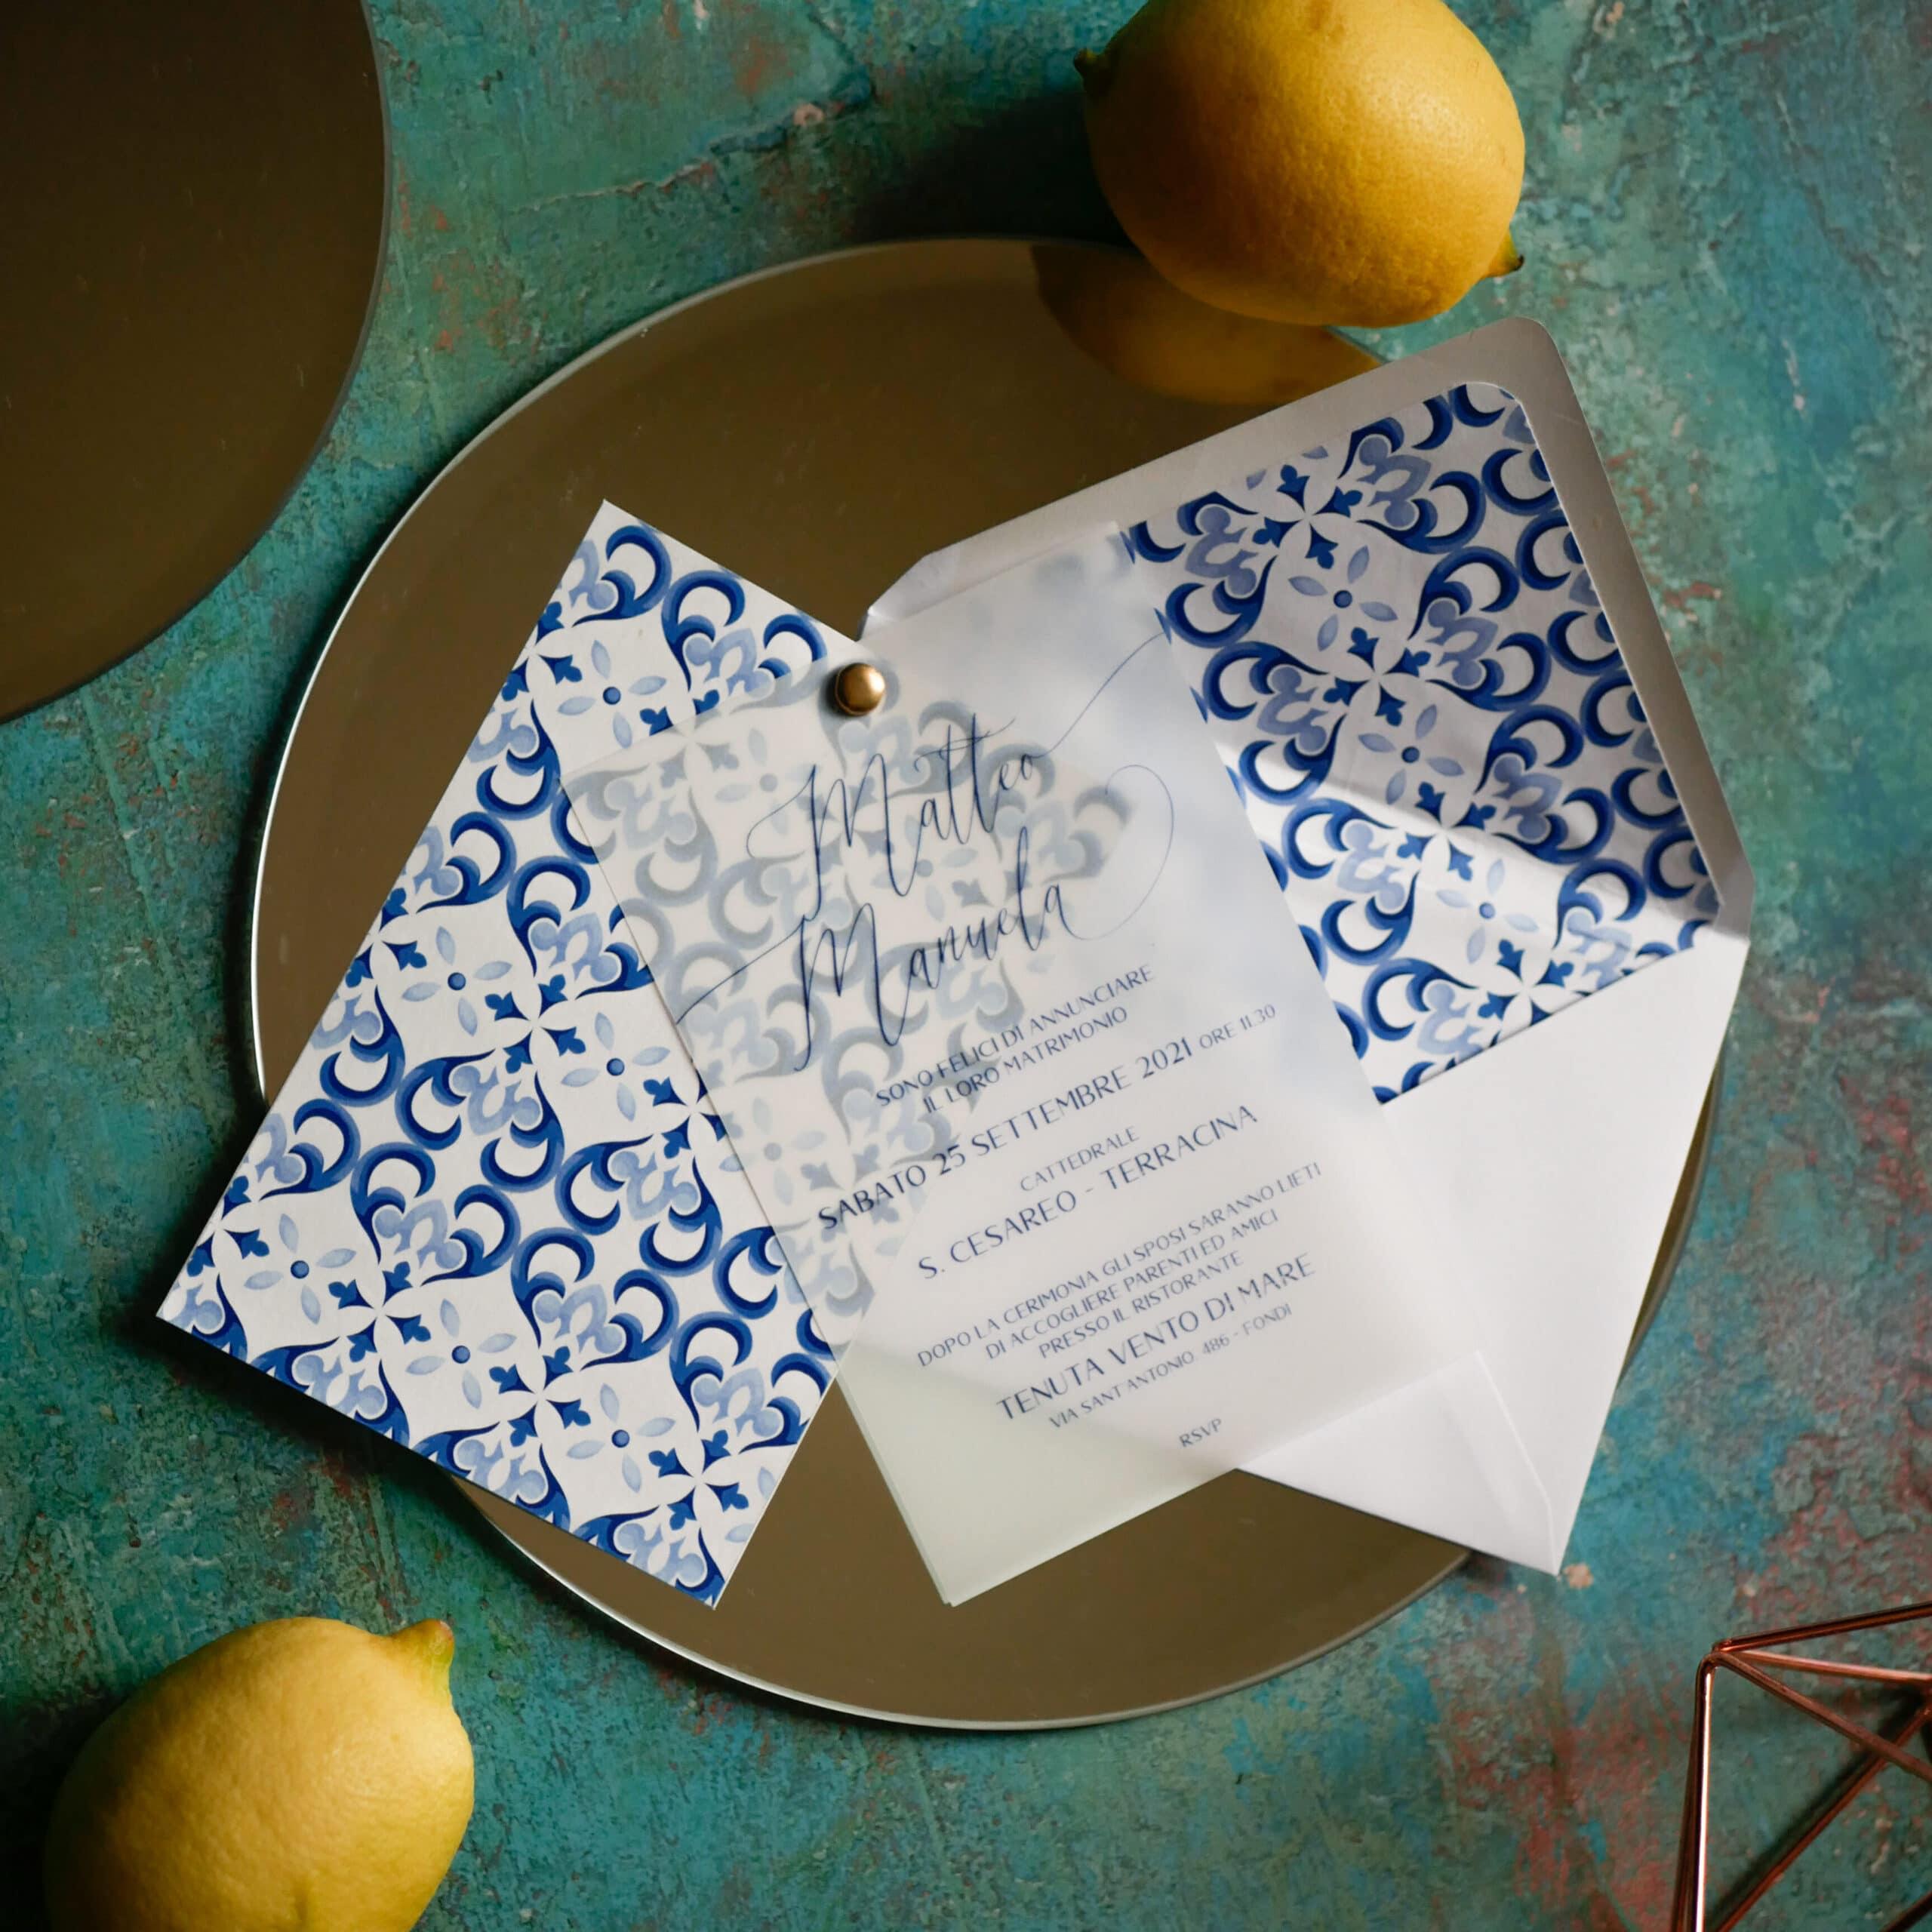 Partecipazione stile amalfi/sorrent/riviera amalfitana/limoni